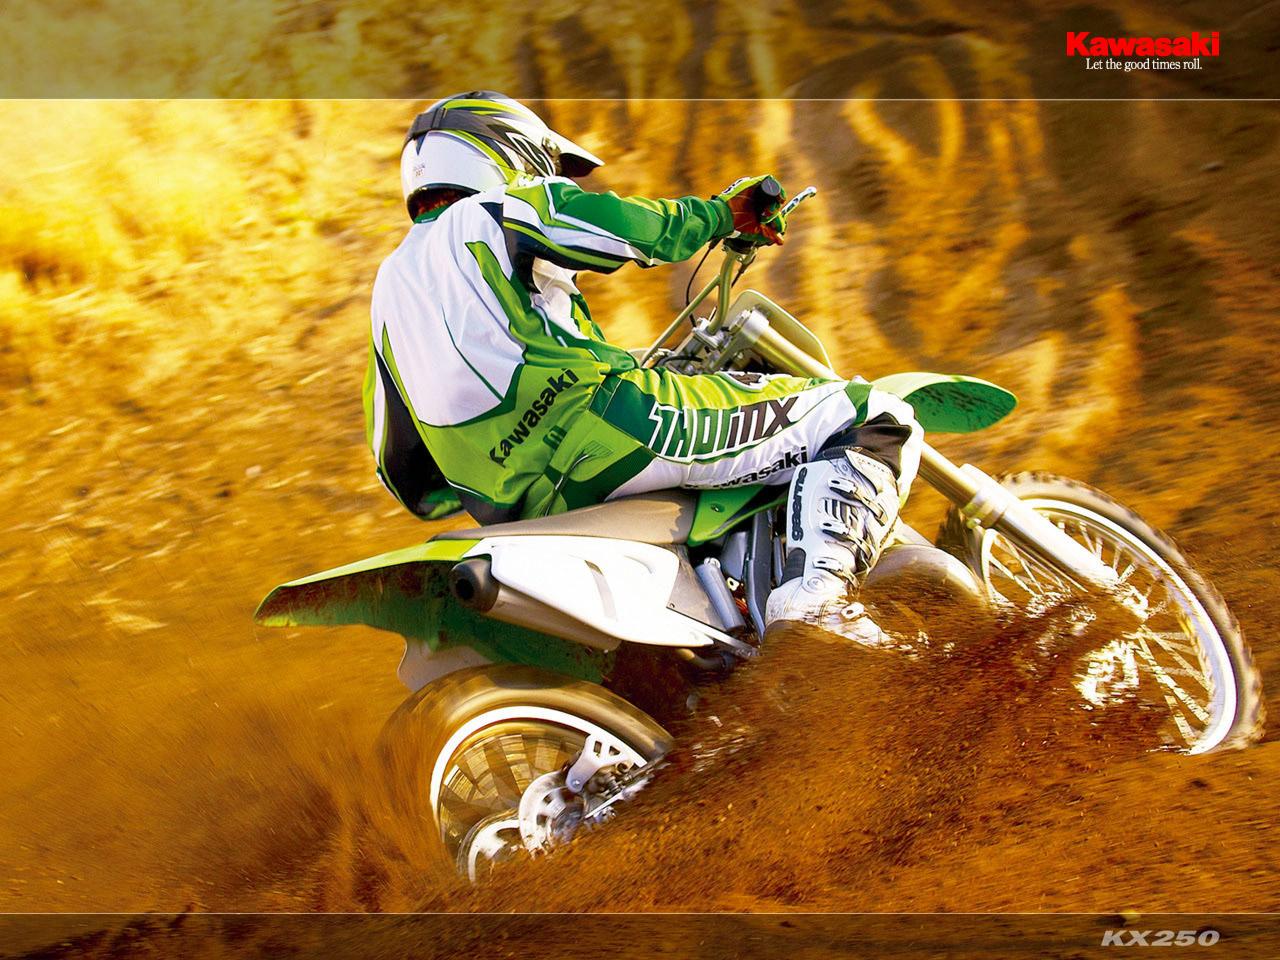 http://1.bp.blogspot.com/-sR99ST9AfrM/TXYydsyyCcI/AAAAAAAAJt0/zwcp6KH0zw0/s1600/Kawasaki_KX_250_Motocross_Bike_bike_wallpaper.jpg